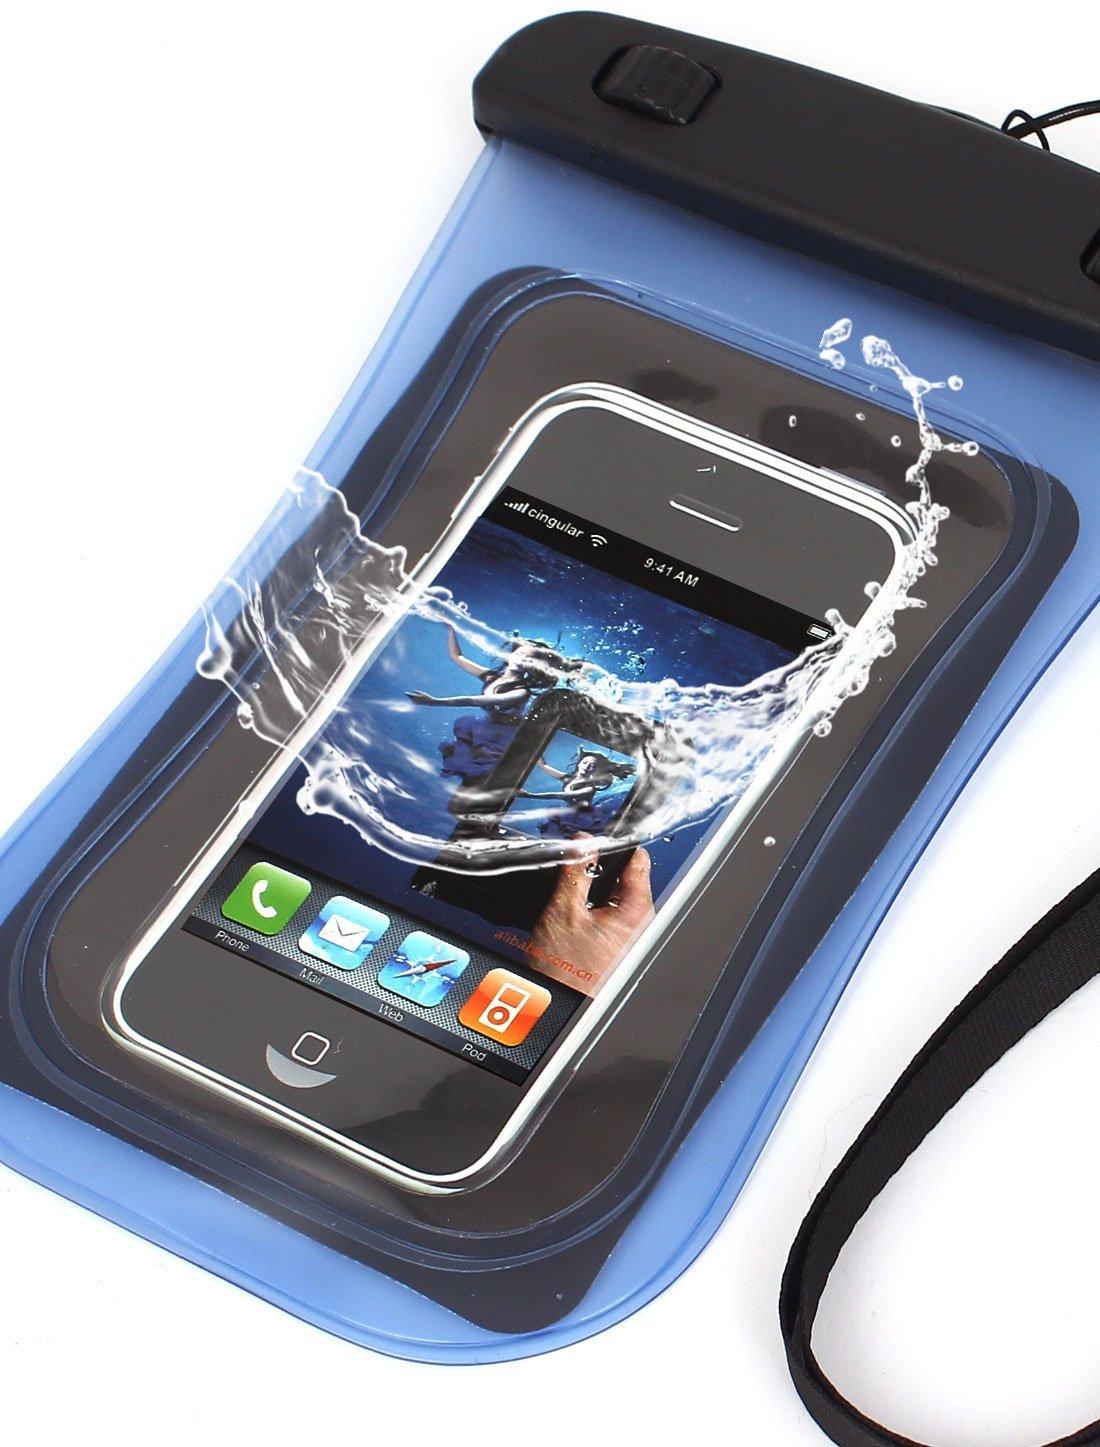 Amazon.com : eDealMax Funda impermeable del bolso seco de la piel cubierta Universal de la Bolsa Azul Para el teléfono celular : Sports & Outdoors